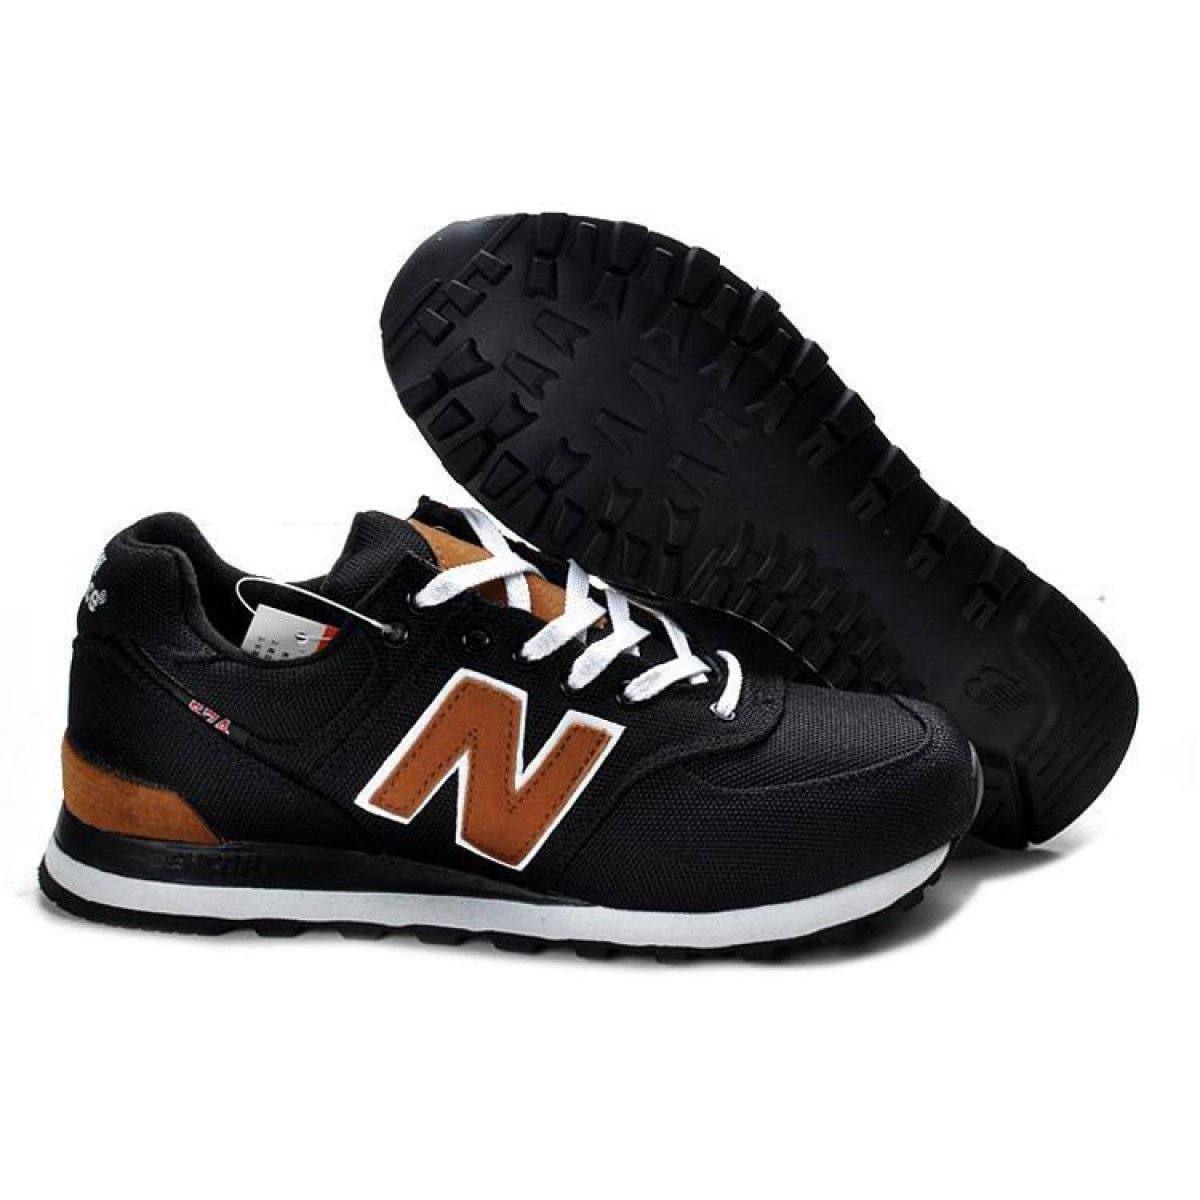 Poner la mesa eterno esponja  New Balance 574 Womens NB ML574PBK Retro Black Brown Shoes   Running shoes  for men, Womens backpack, New balance 574 womens